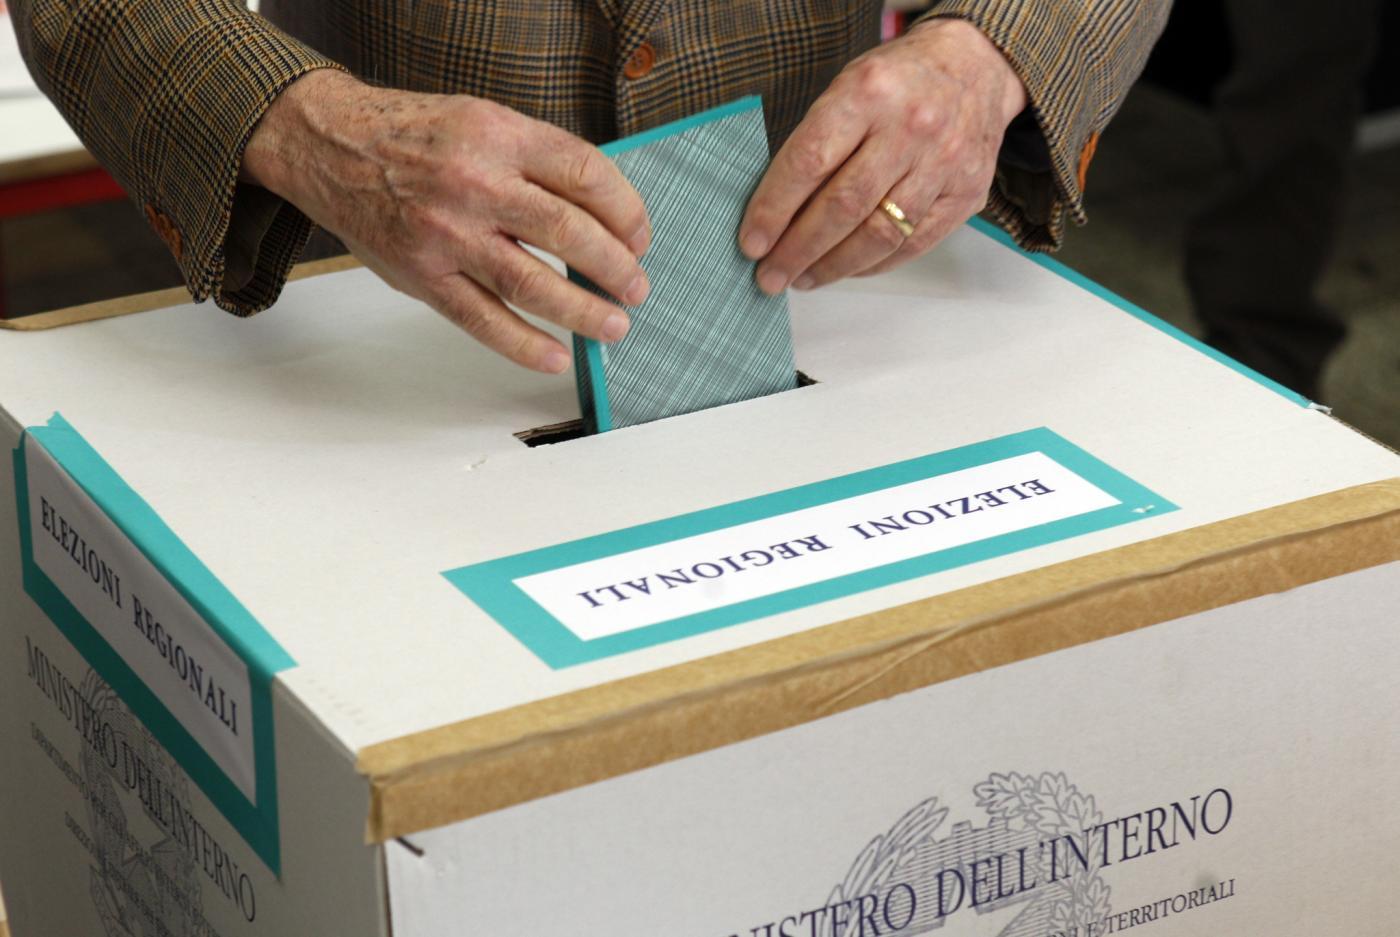 Regionali in Sicilia, chiamate alle urne 4,6 milioni di persone